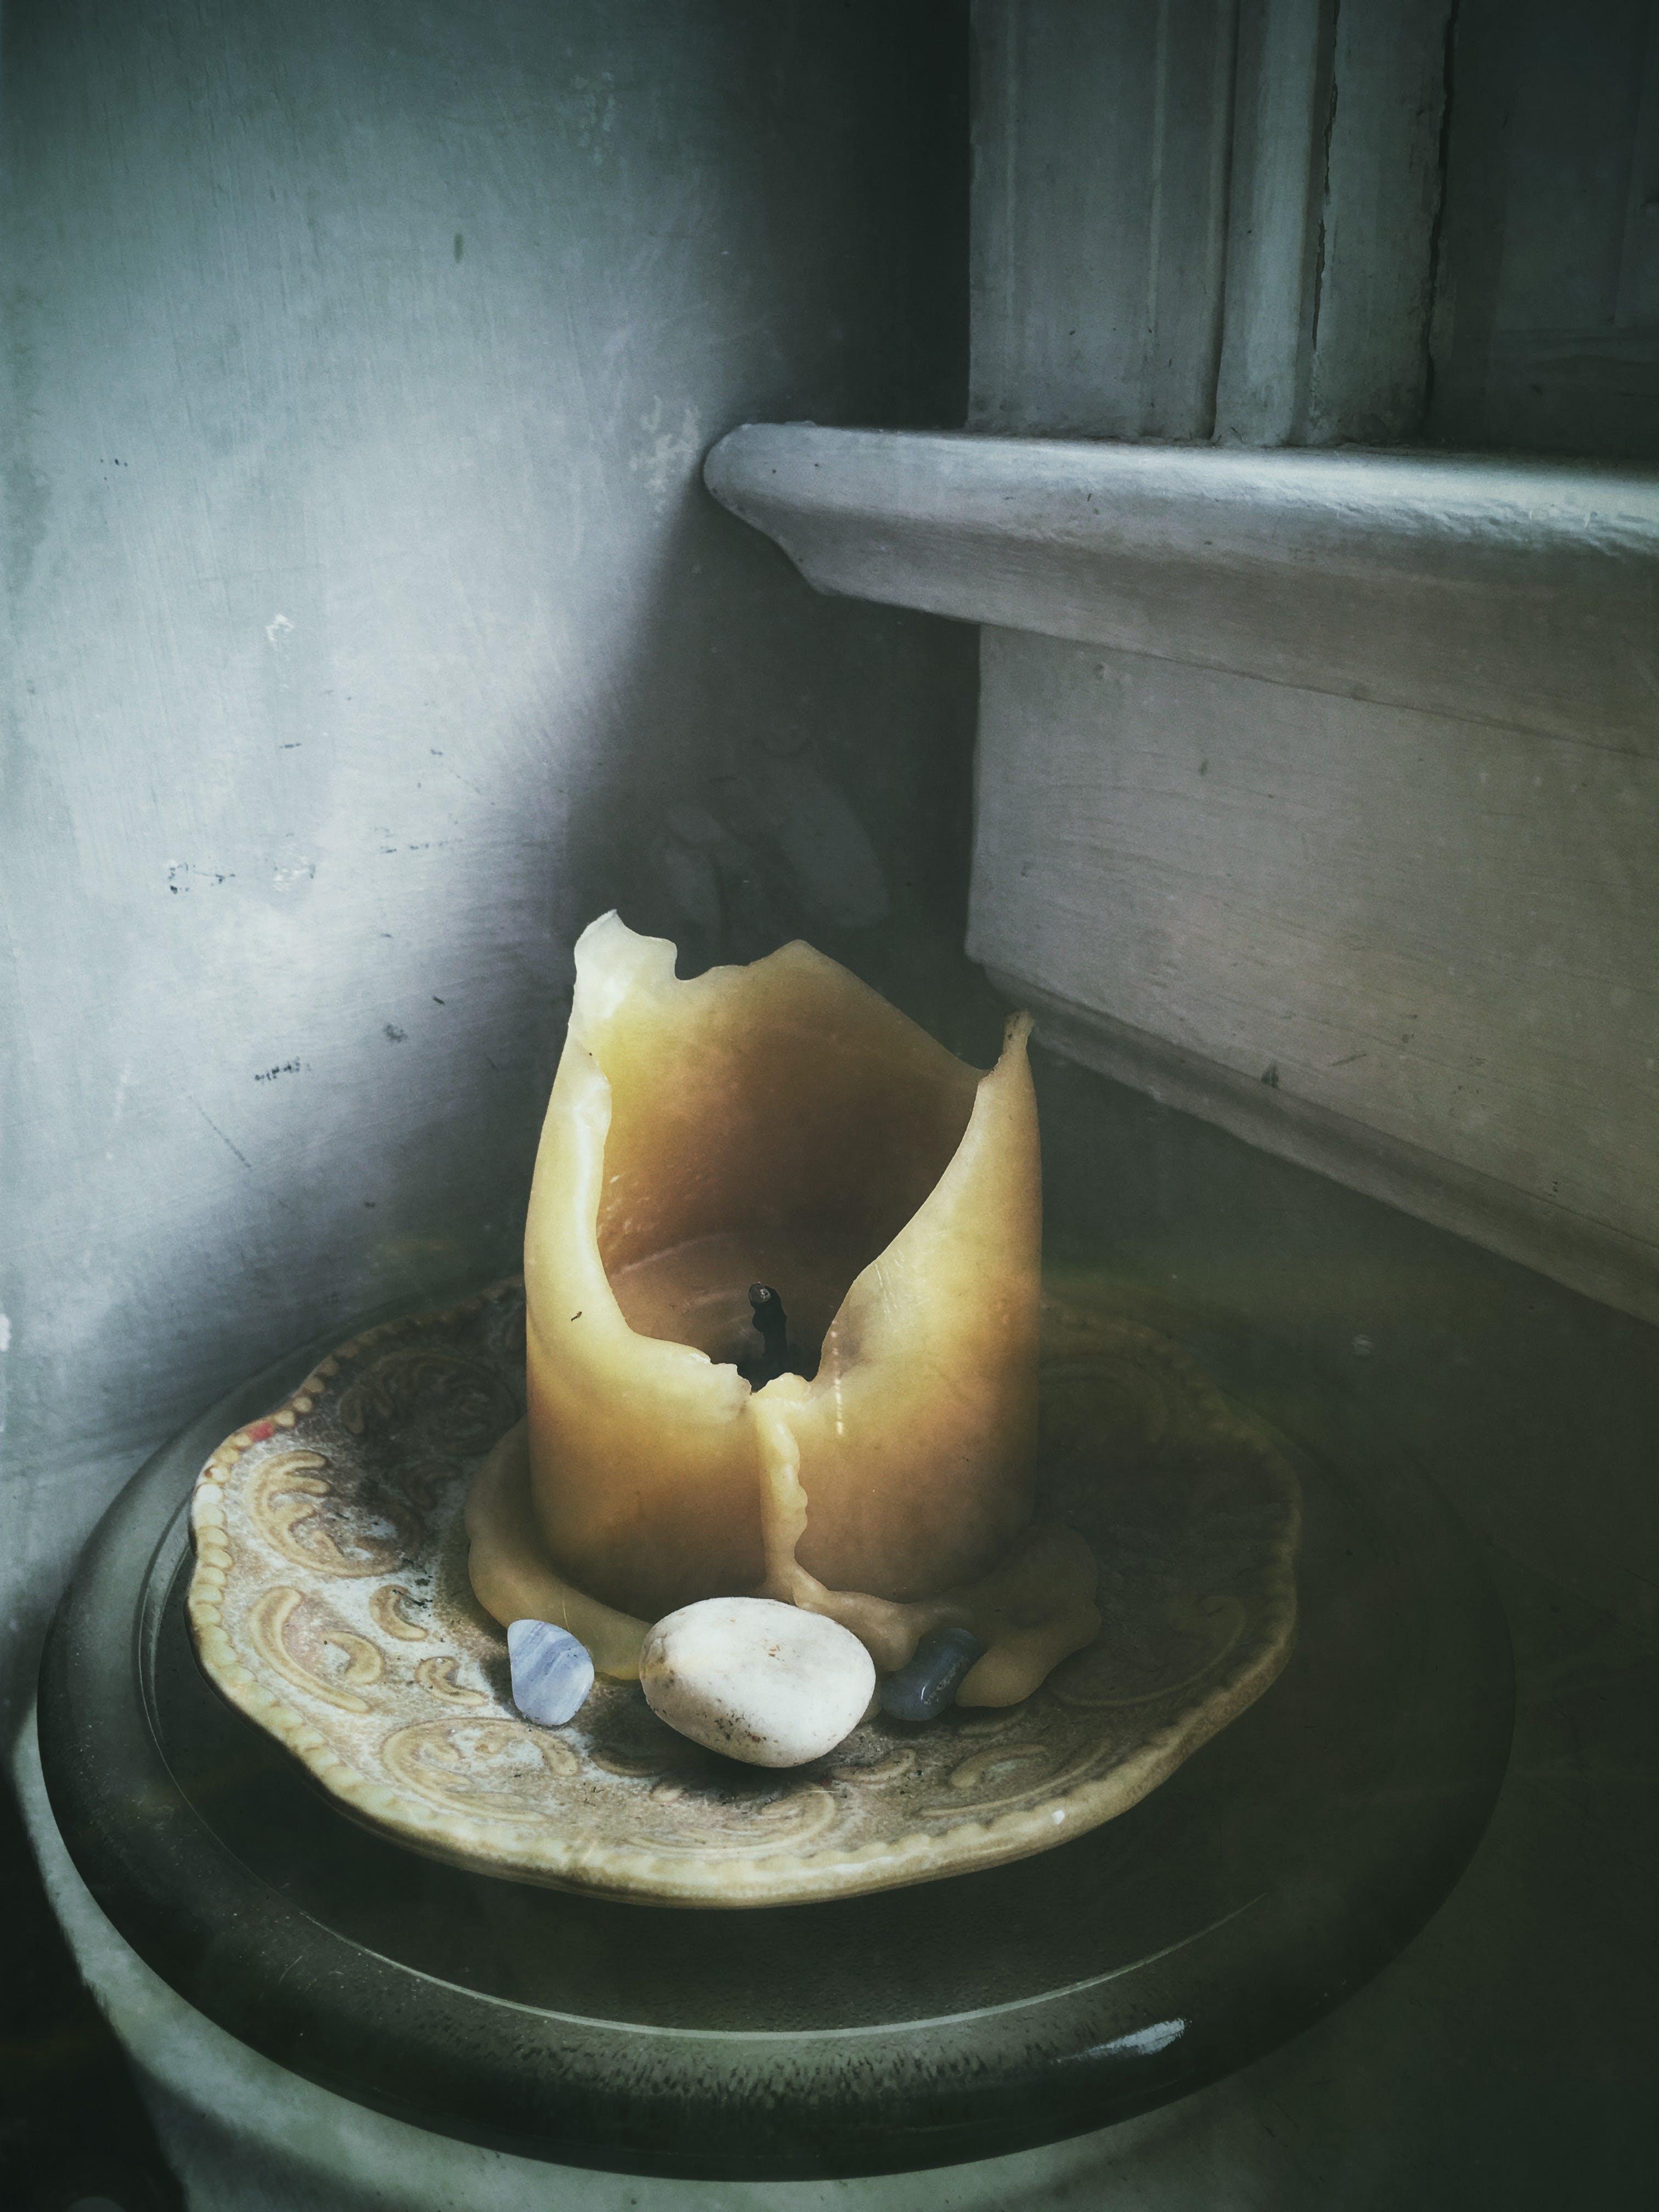 Beige Candle on Beige Saucer Plate Beside Polished Pebbles Near Window